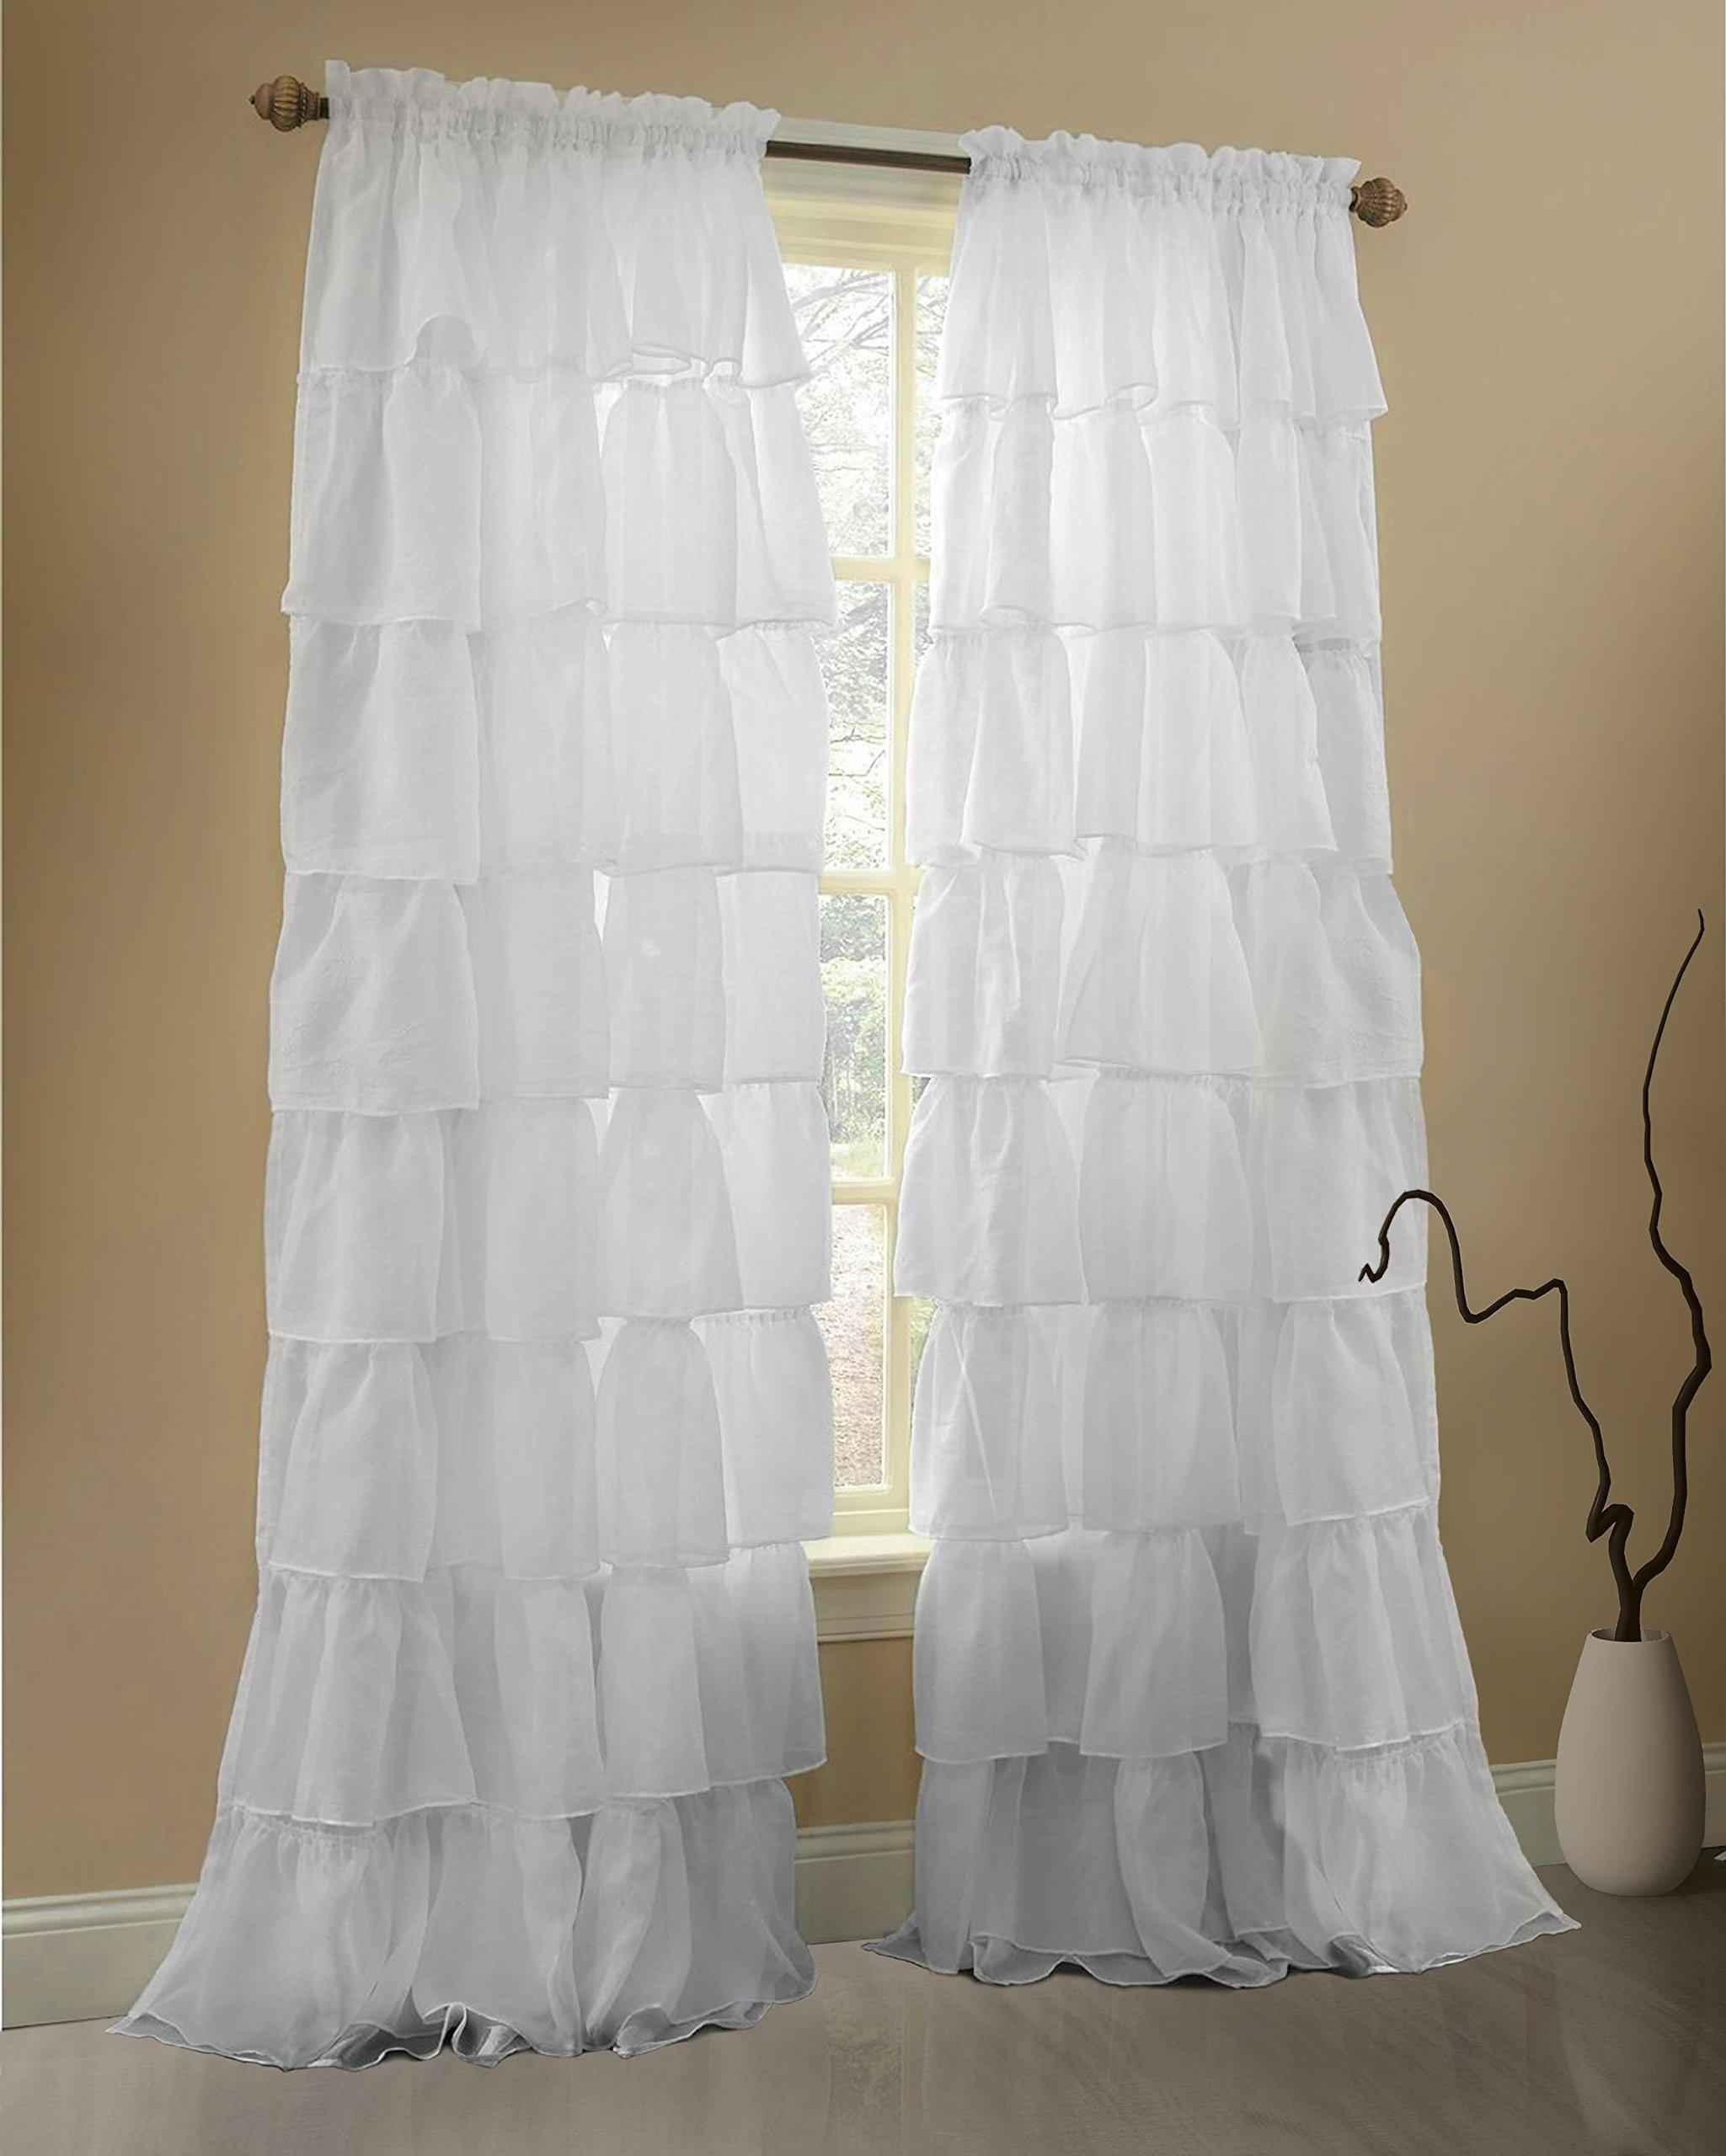 Black ruffle curtains - Description